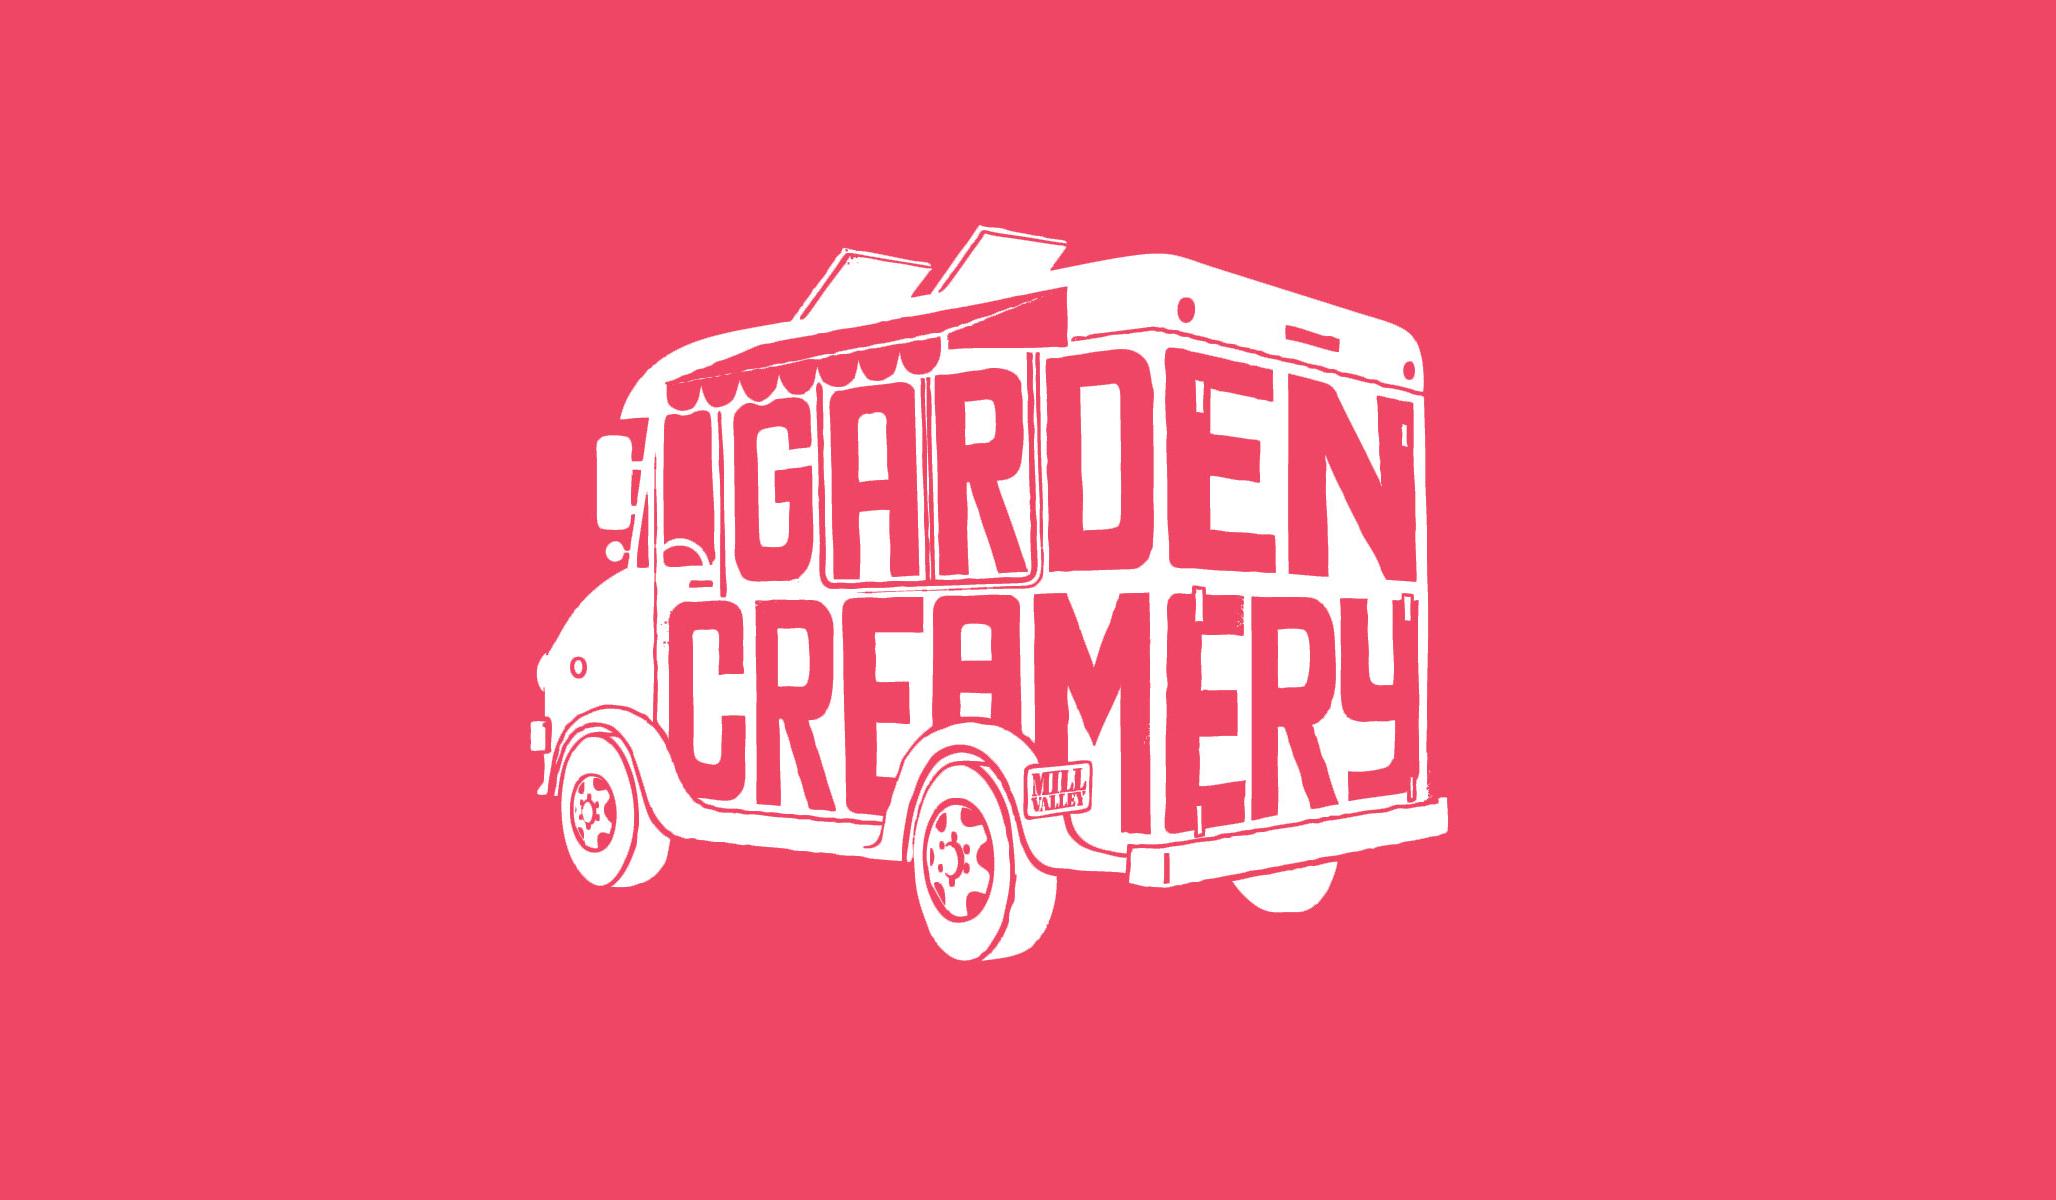 Garden creamery ice cream truck logo displayed in white and pink